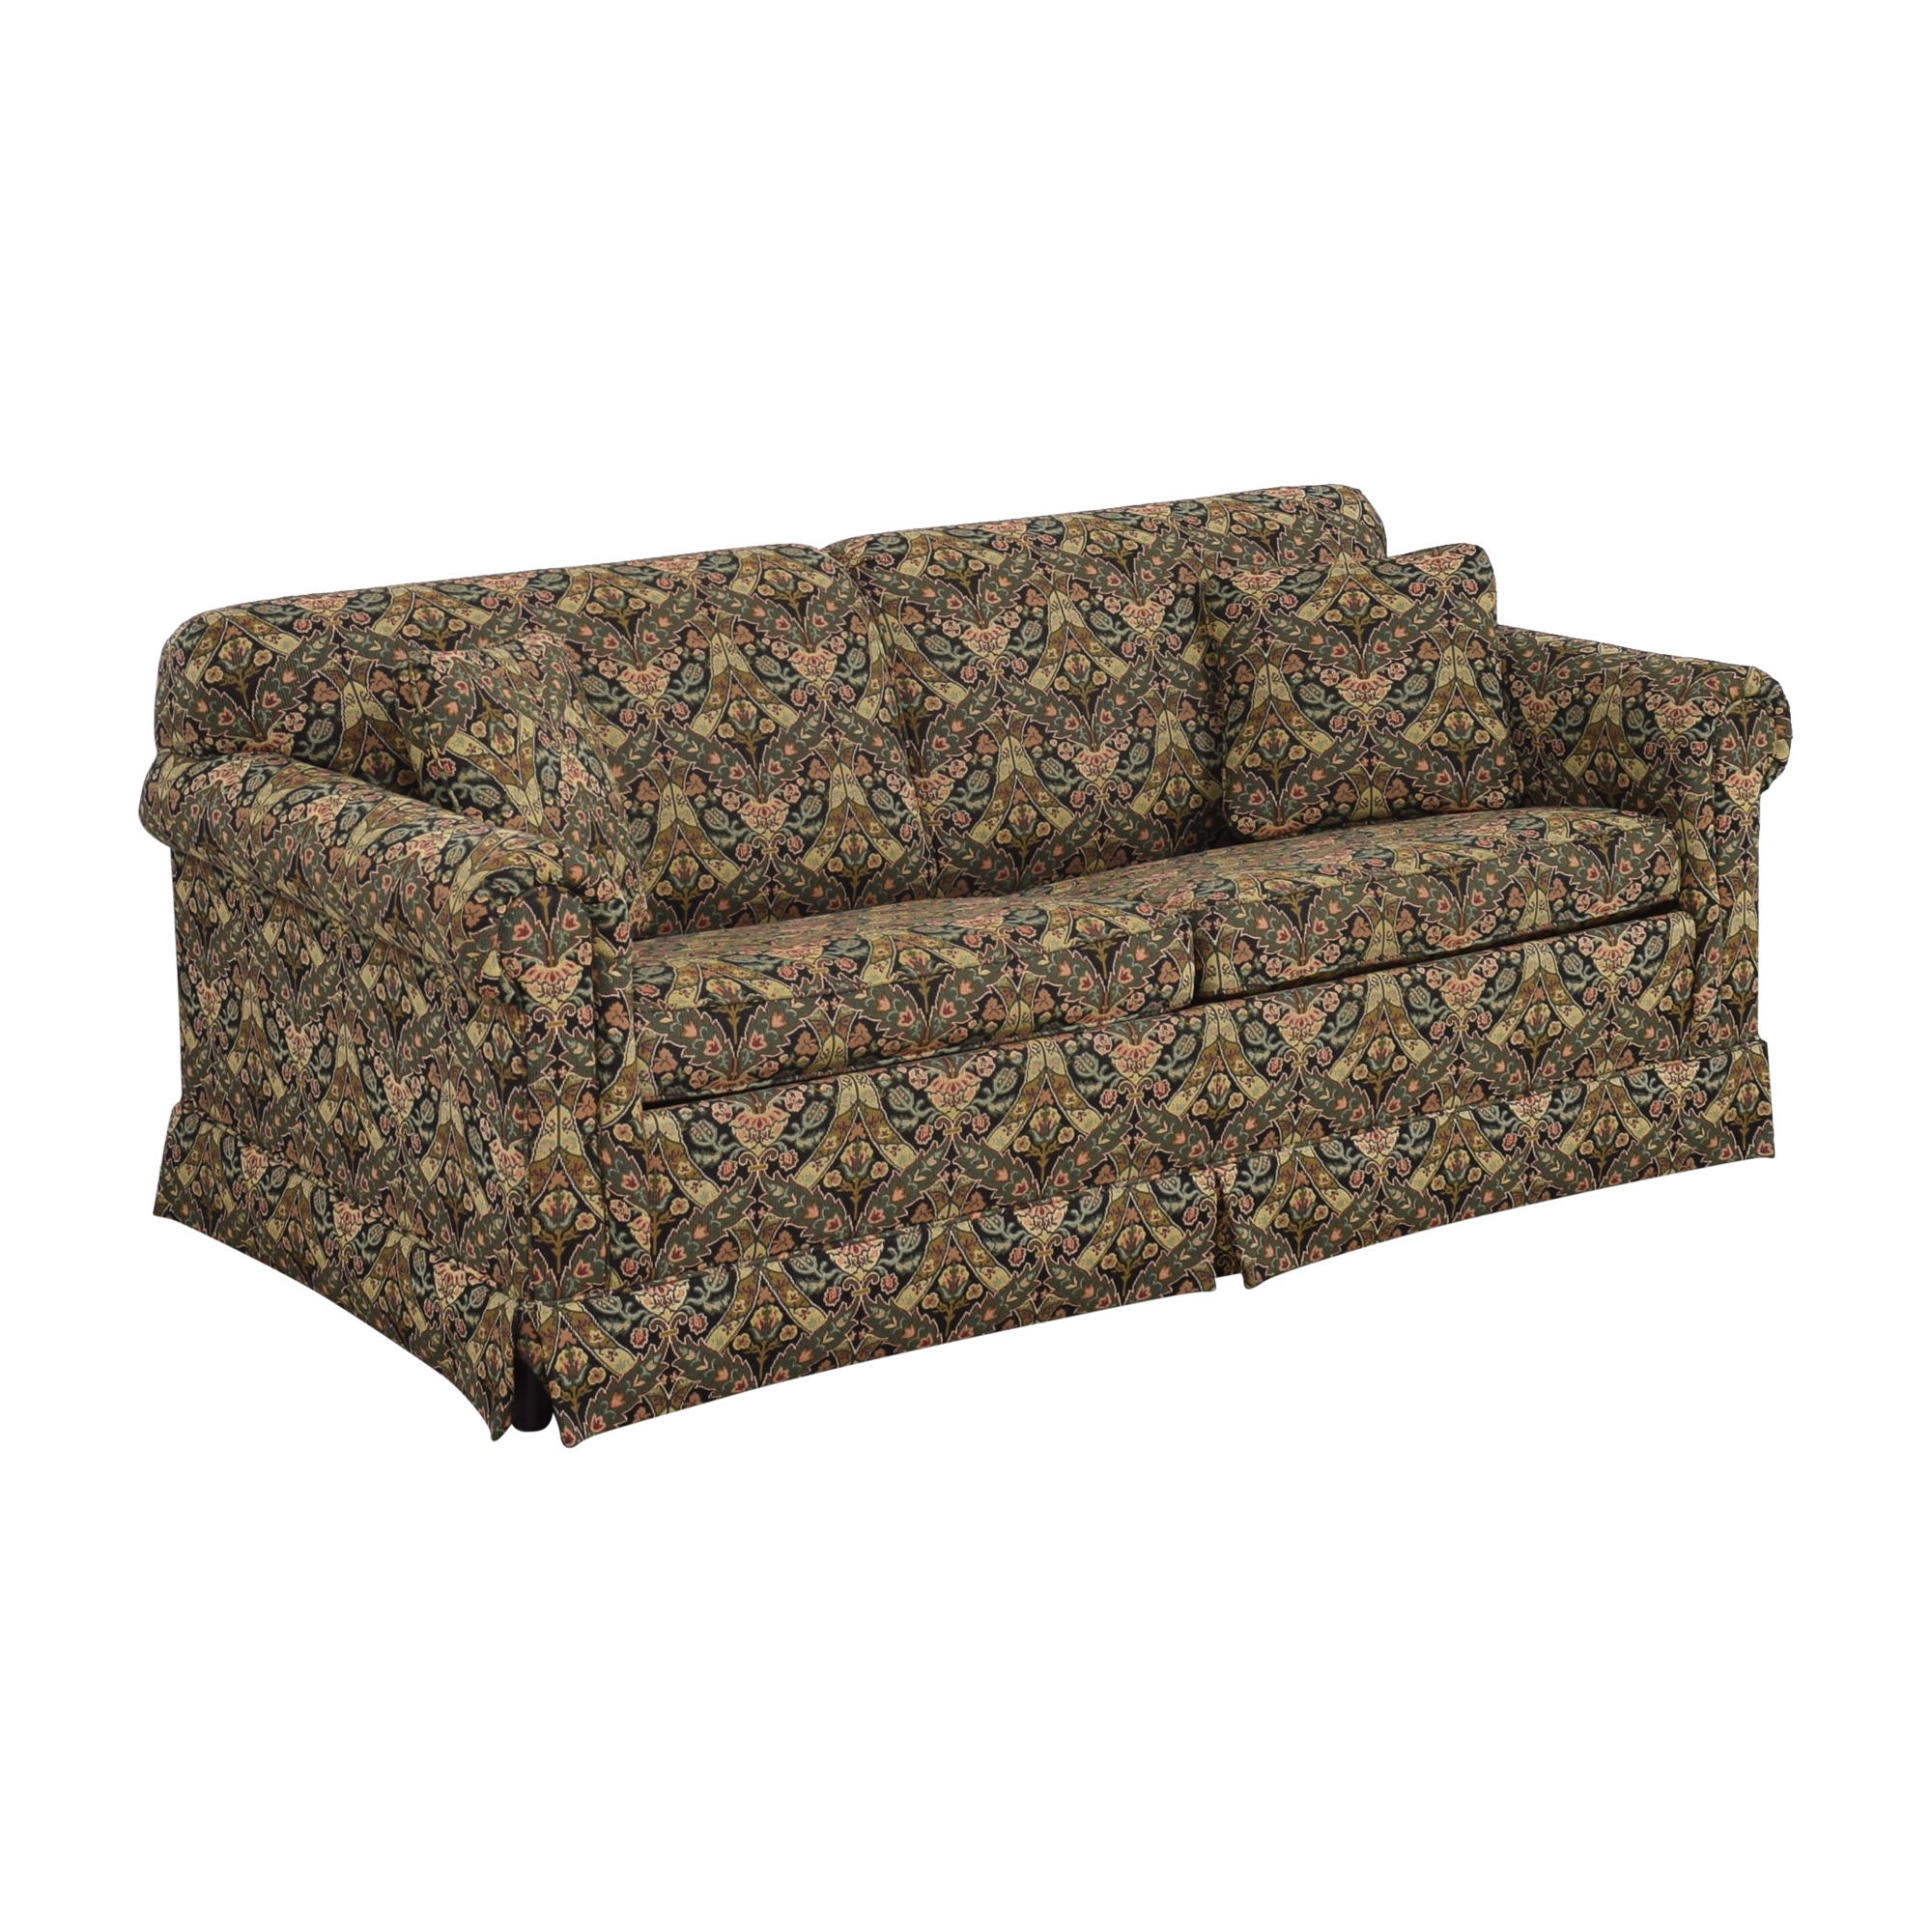 Ethan Allen Ethan Allen Full Sleeper Sofa discount